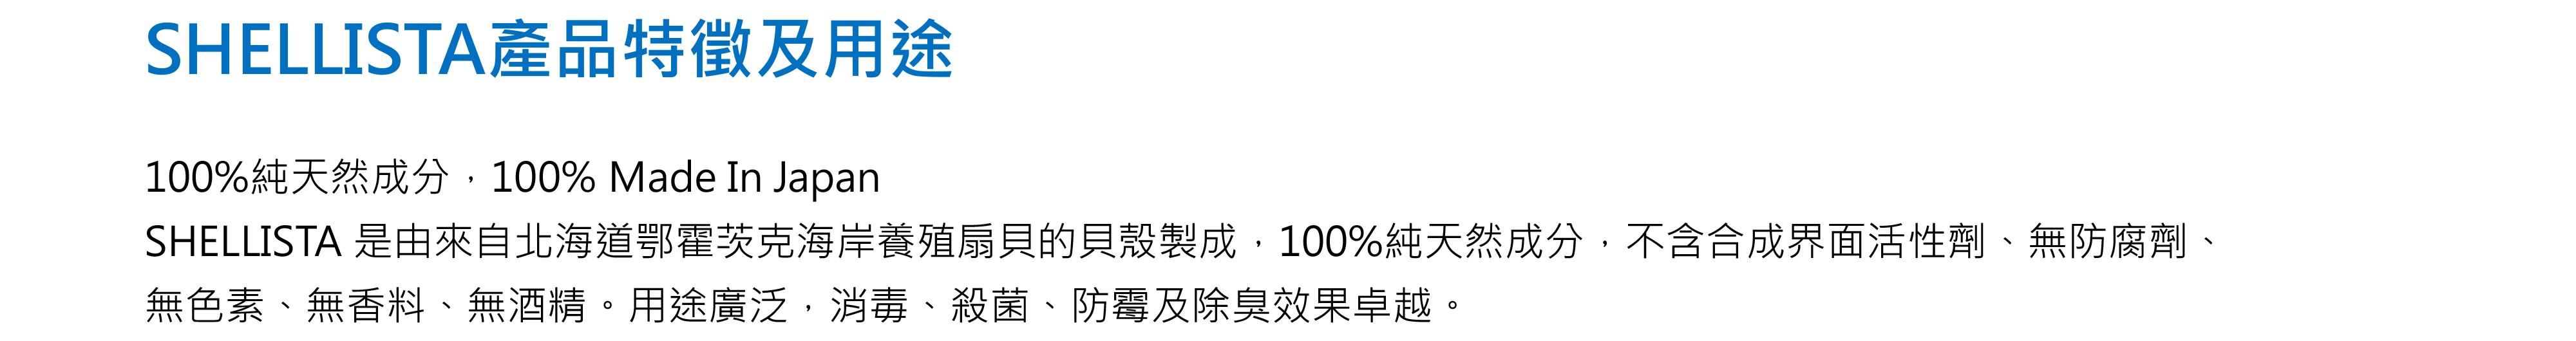 SHELLISTA天然貝殼消毒除臭粉,來自日本北海道。有效消毒、防霉及清除頑固臭味,並能洗除蔬菜水果上的果臘、防腐劑、霉及殘留農藥。100%全天然,不含合成界面活性劑、防腐劑、色素、香料及其他化學成份。